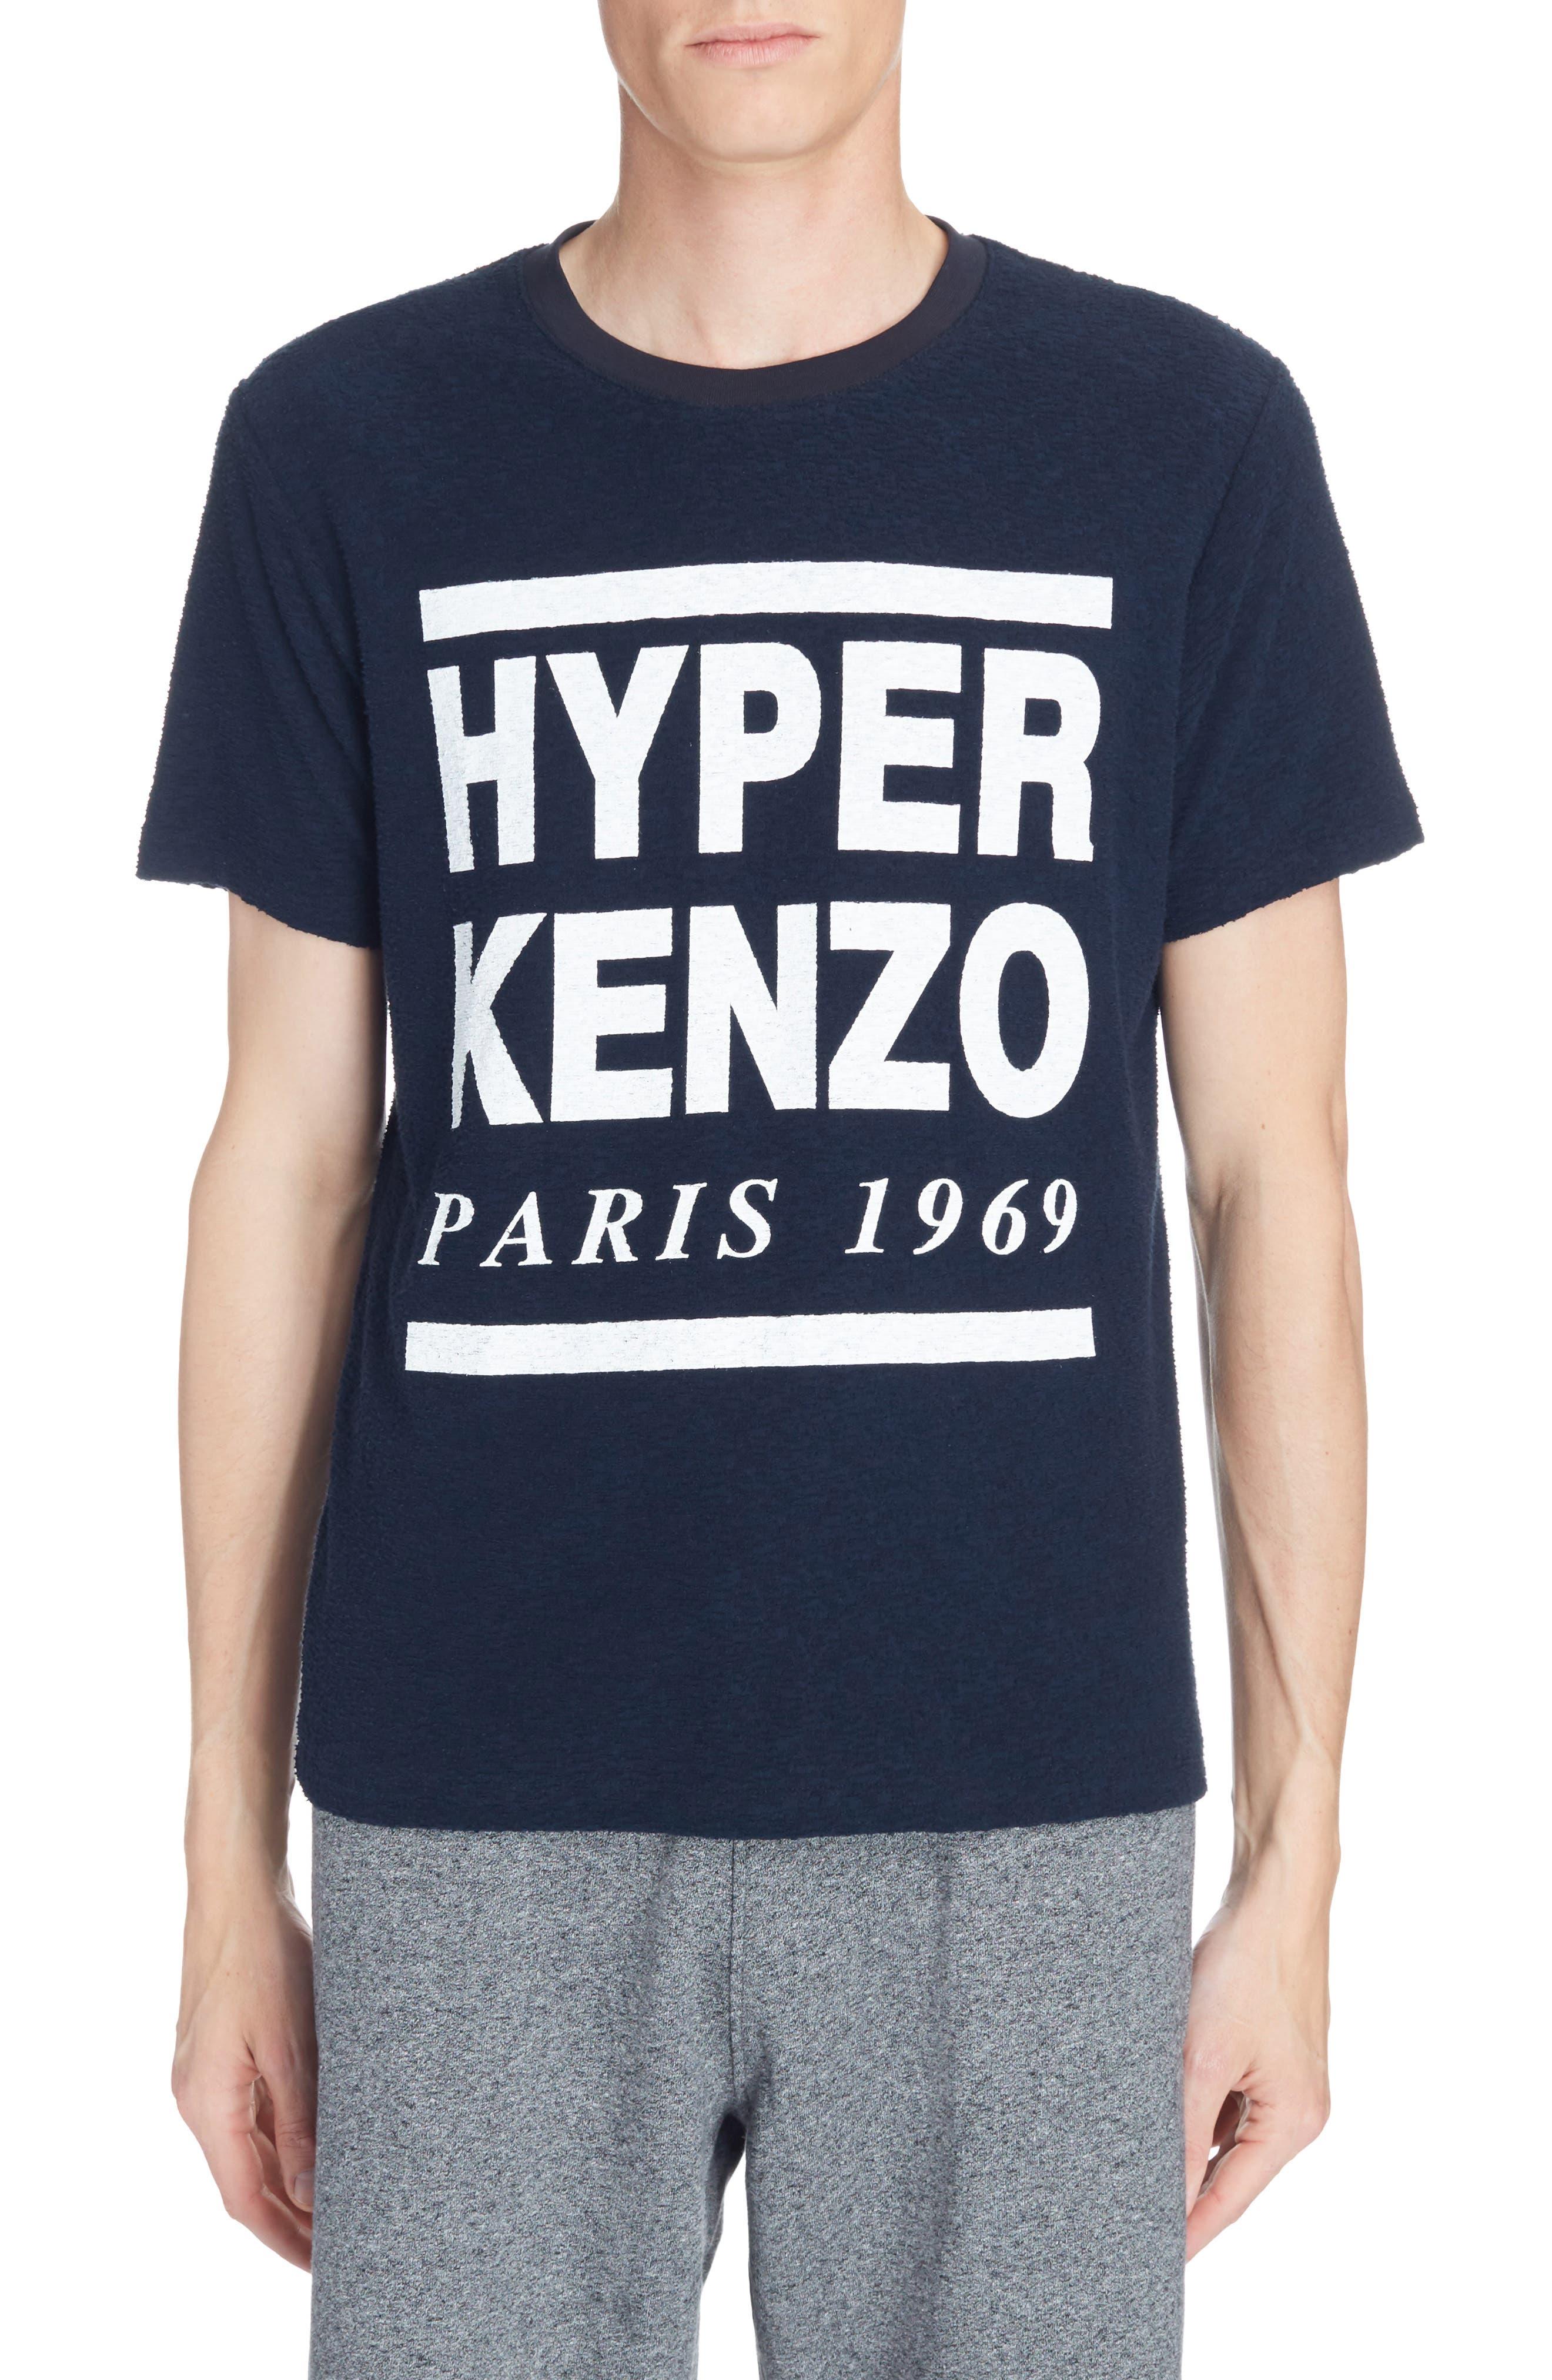 KENZO Hyper Kenzo Logo T-Shirt